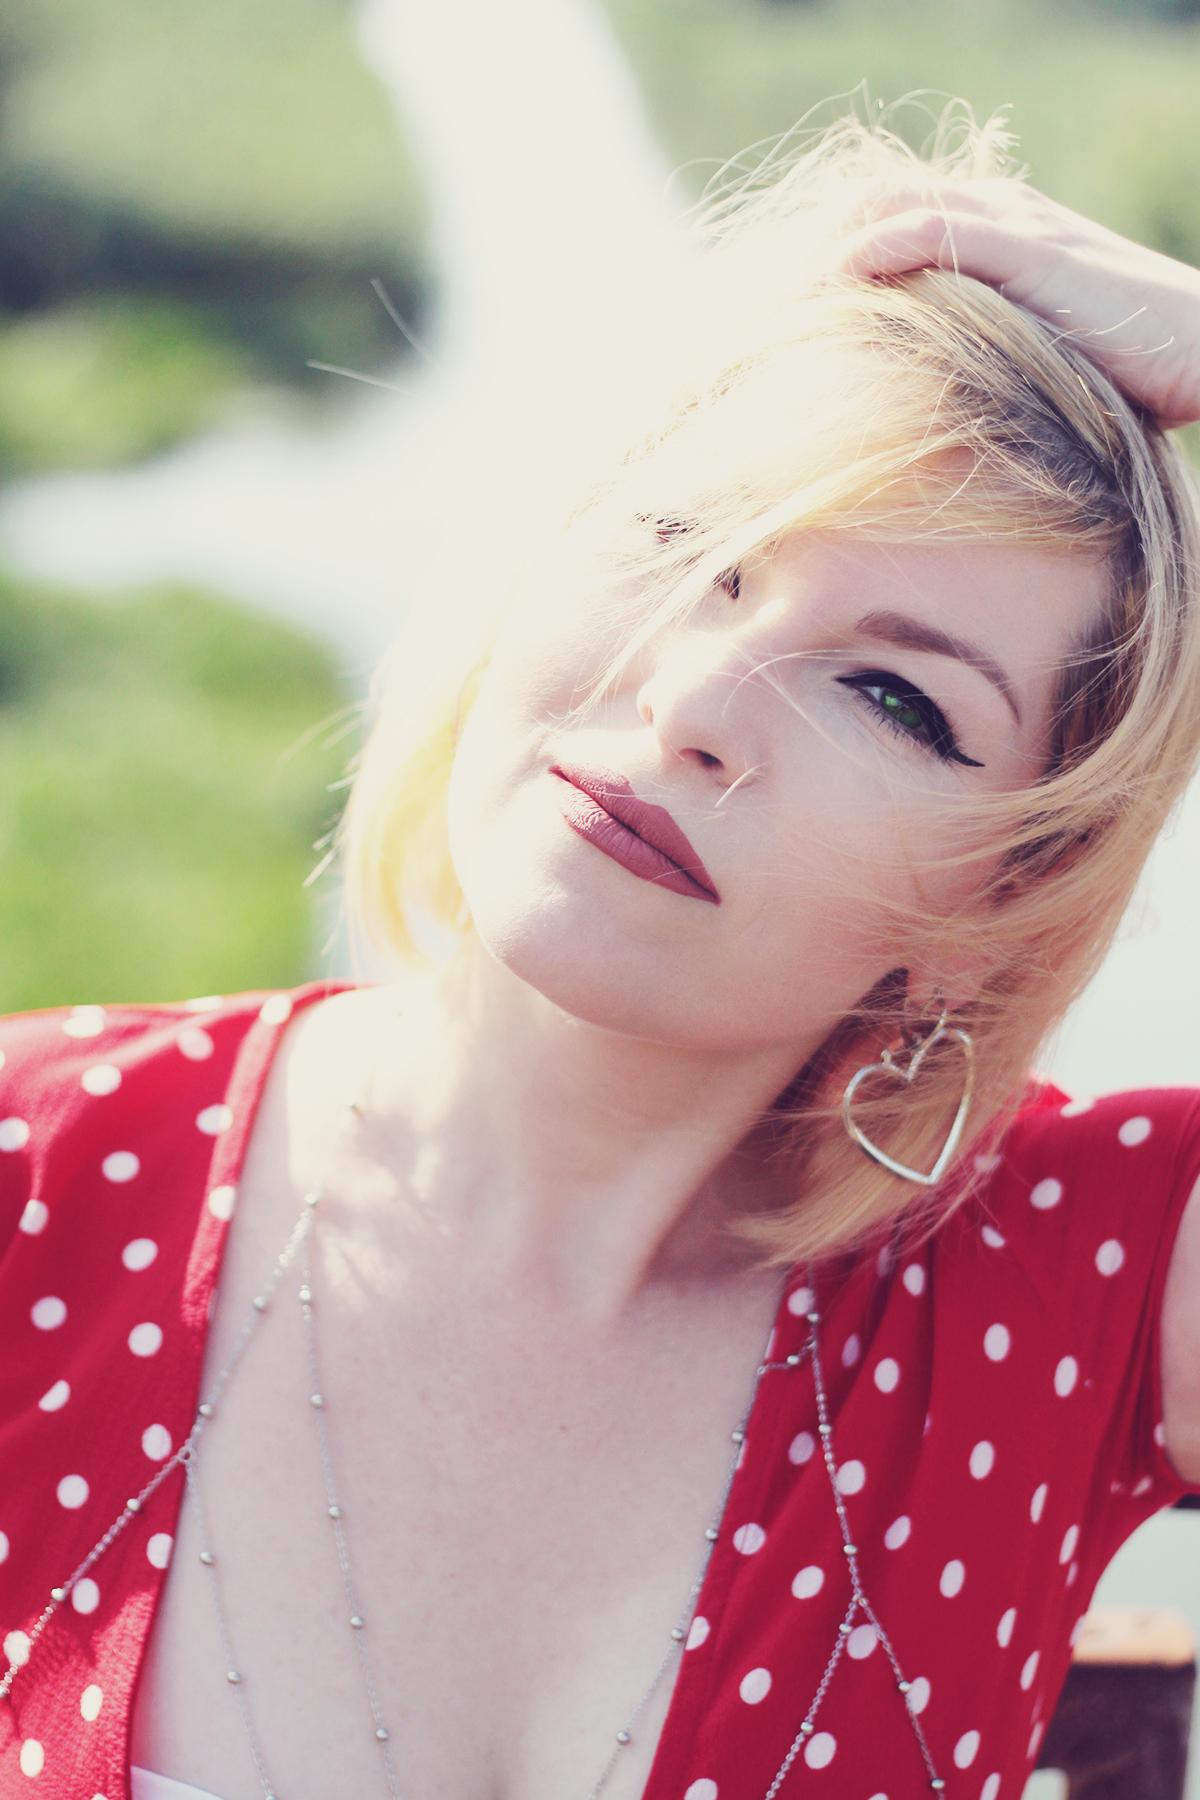 red polka dot dress, body chain, heart earrings, matte lips, make-up, summer